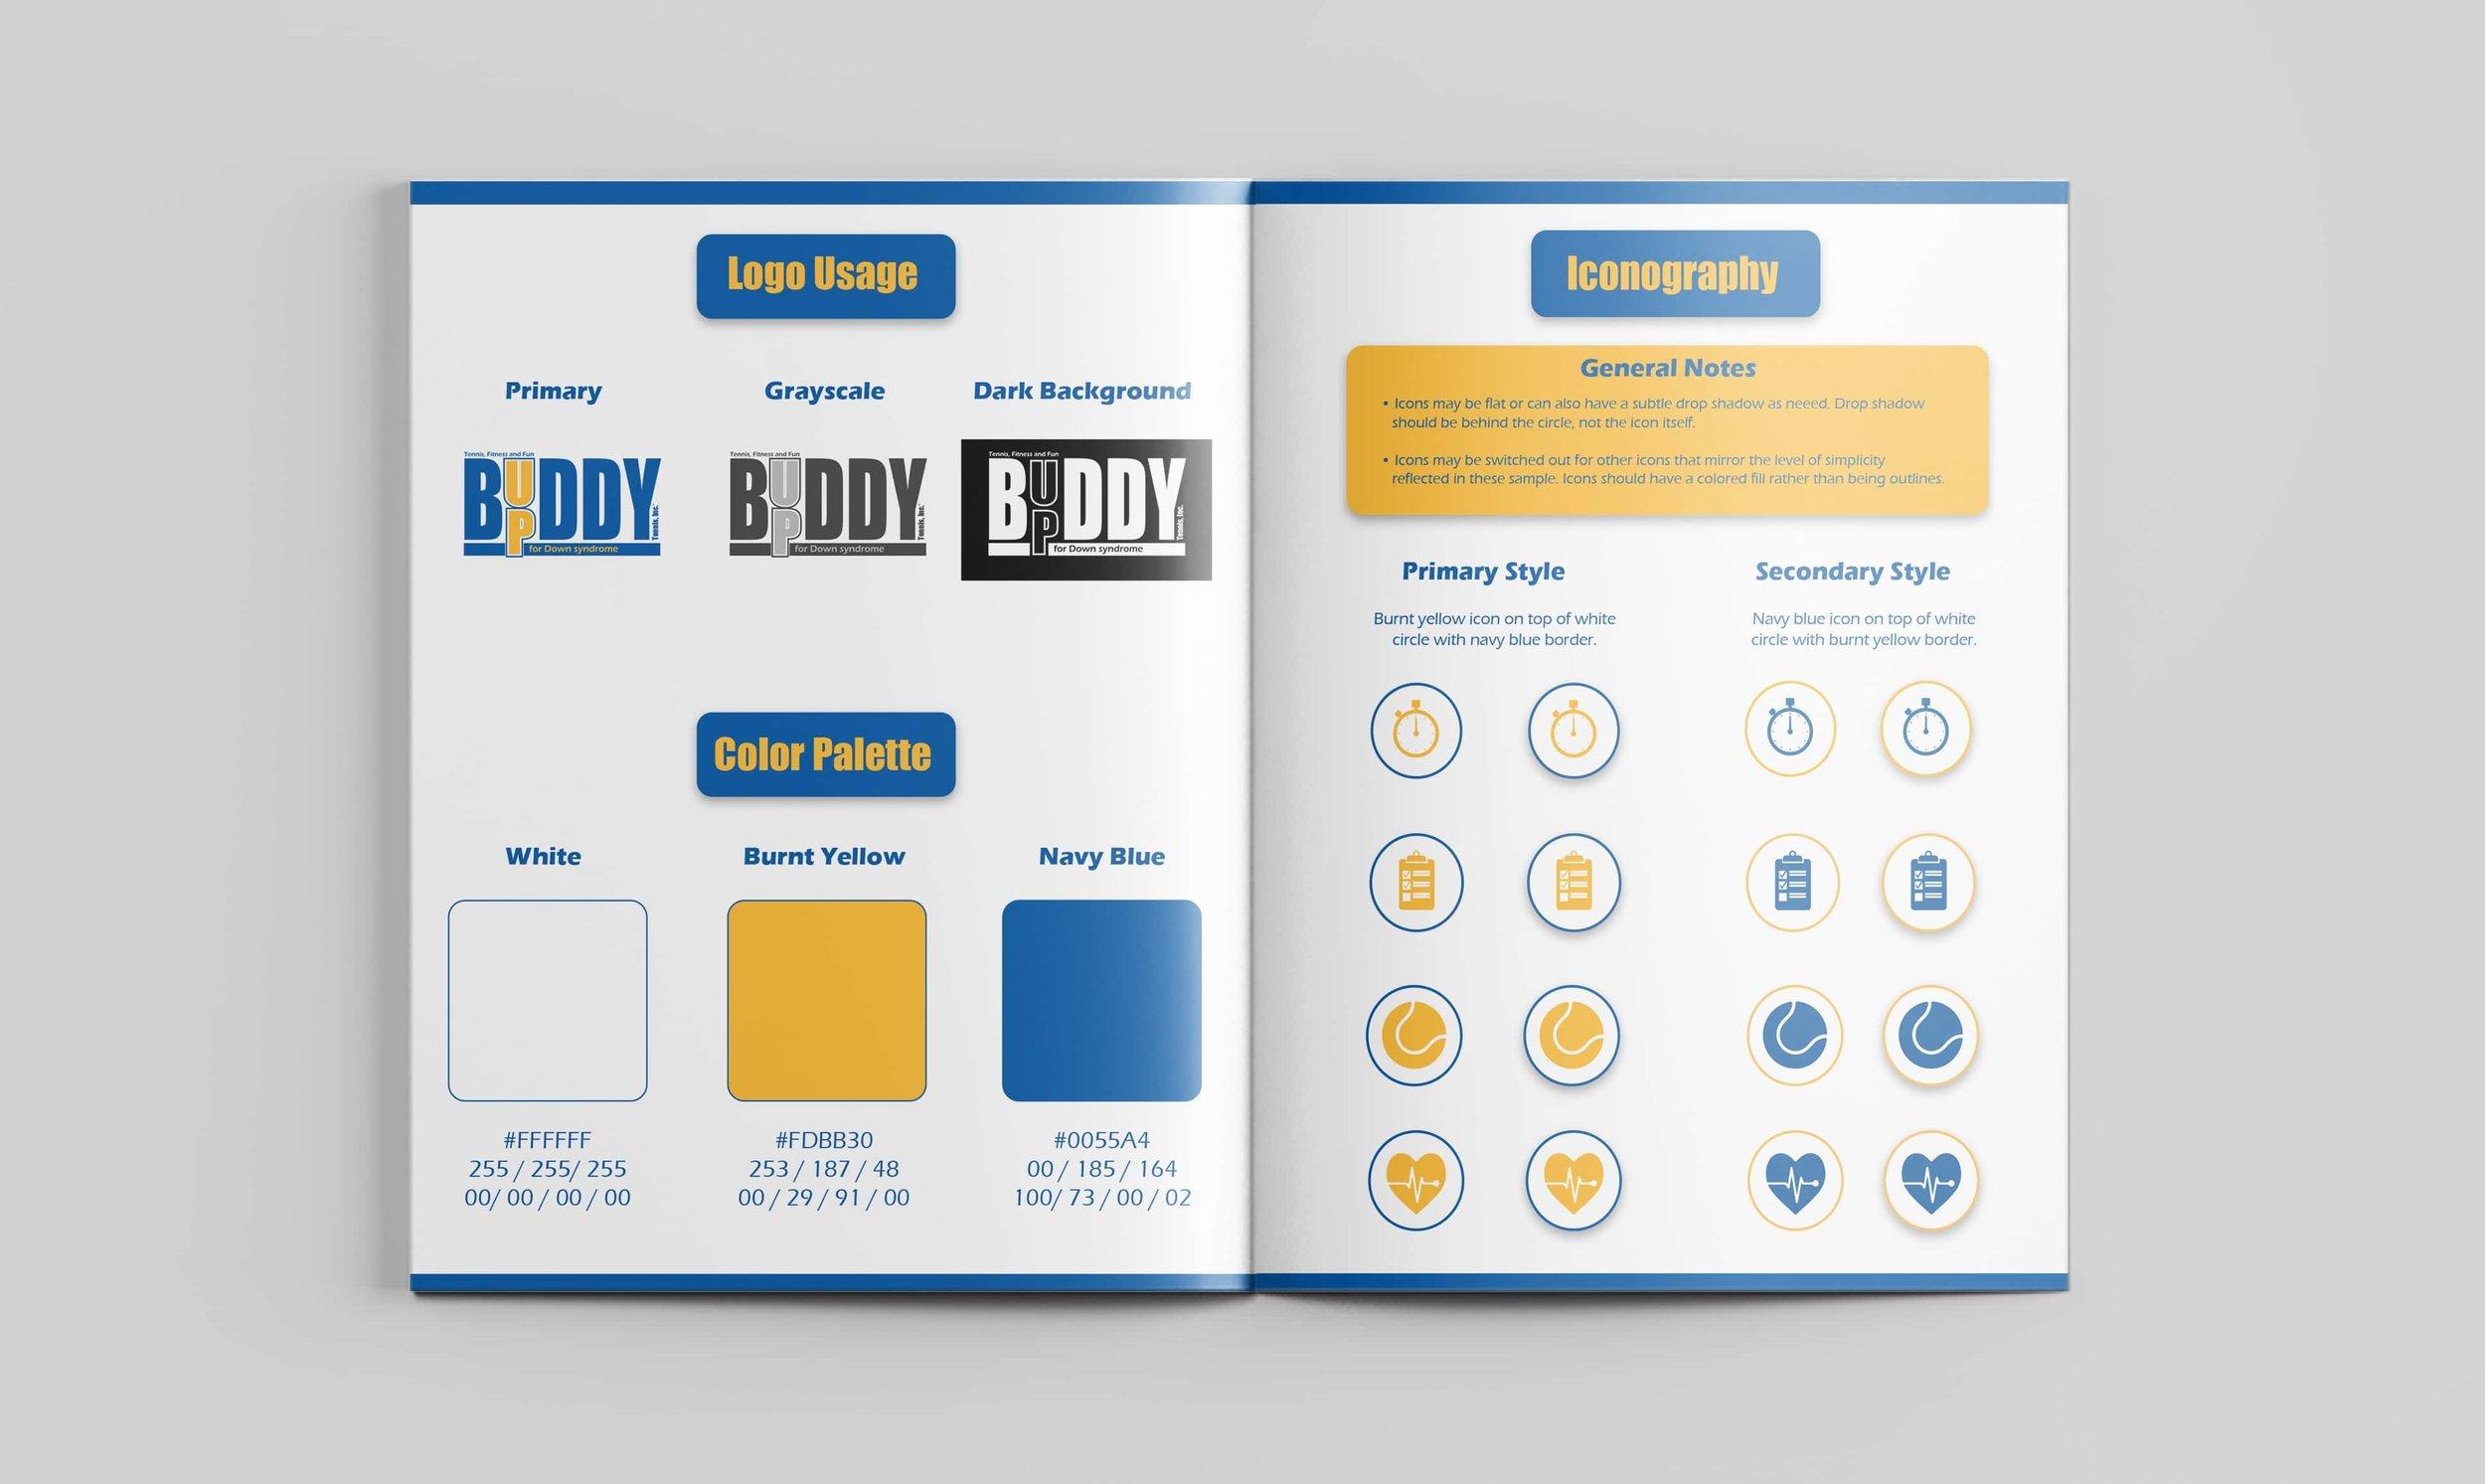 Buddy Up Tennis Brand Guide Mockup1 2.jpg